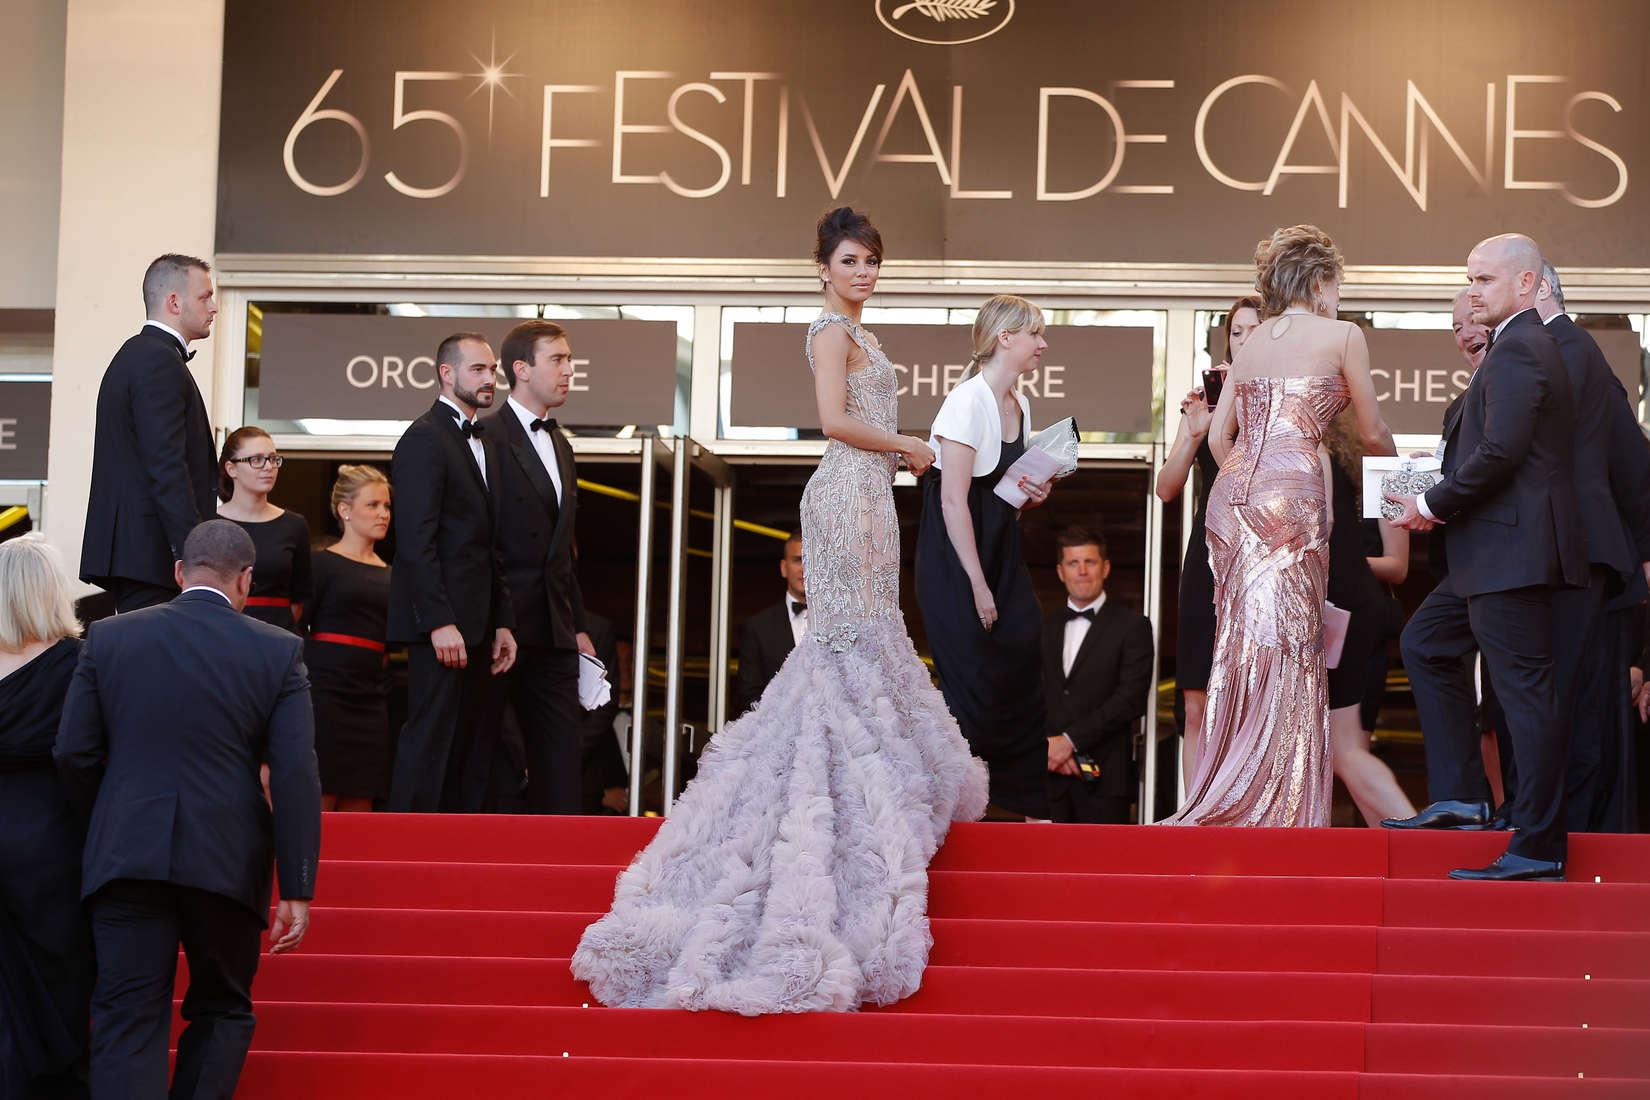 Cannes-Film-Festival-Celeb-Wallpapers.jpg